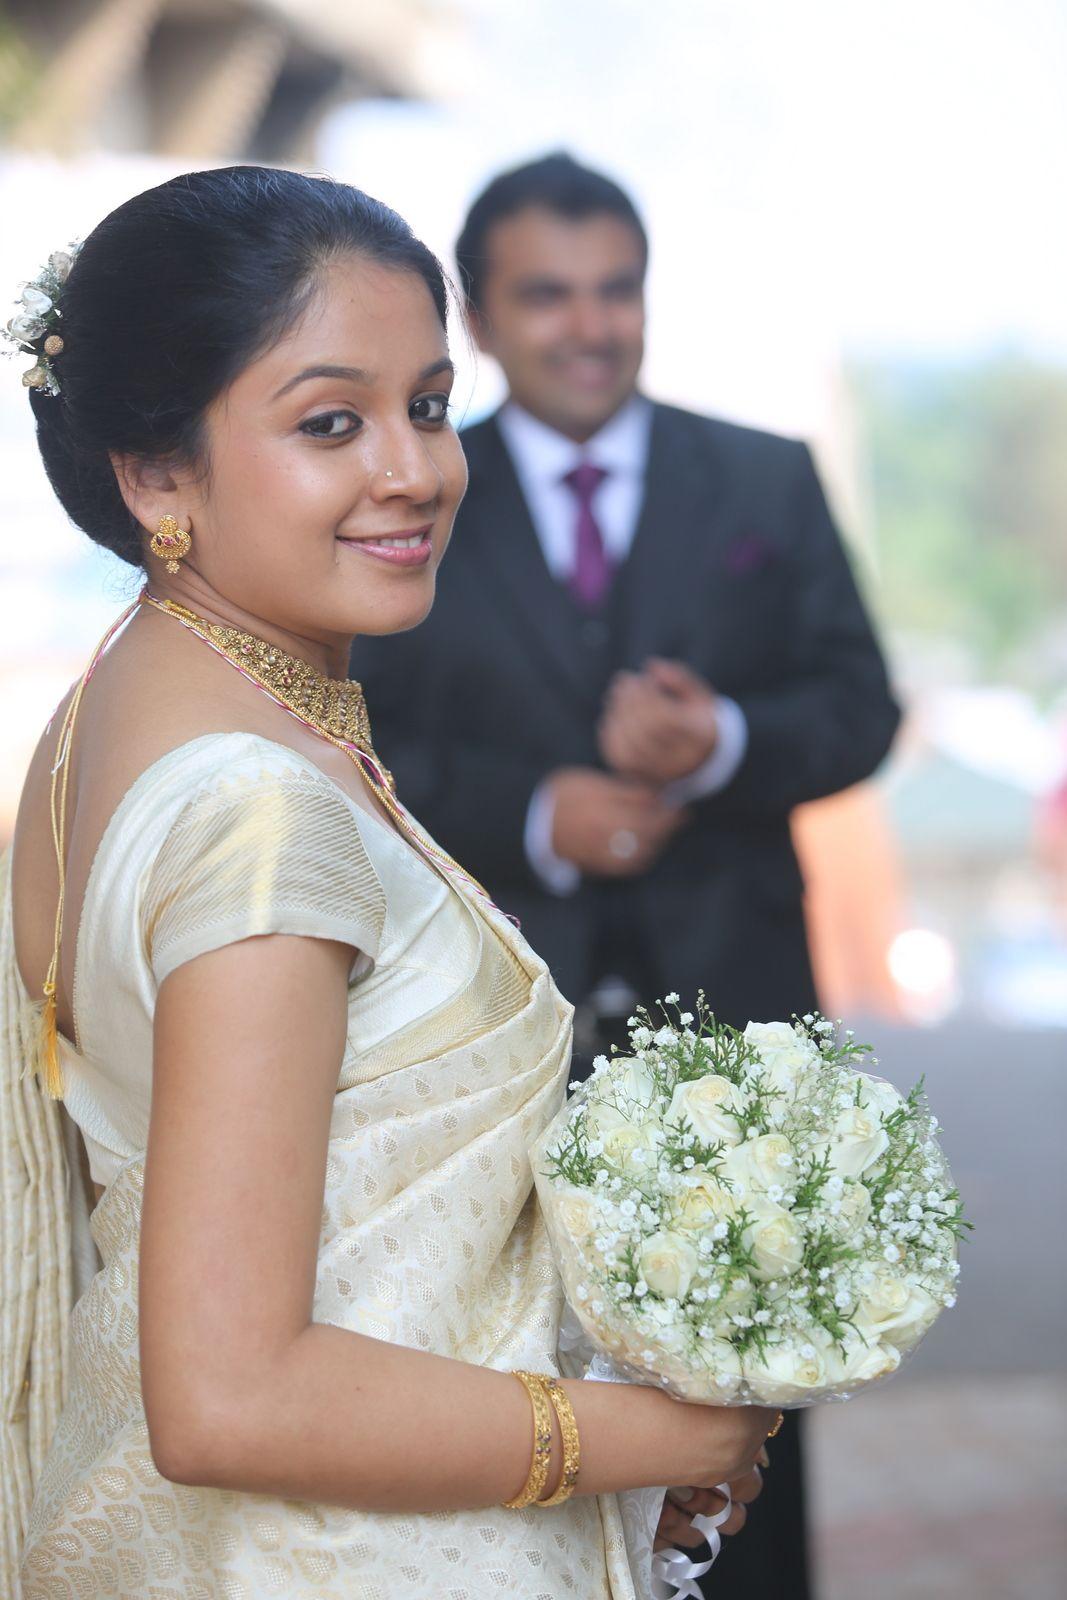 christian bride for matrimony service visit our matrimony website